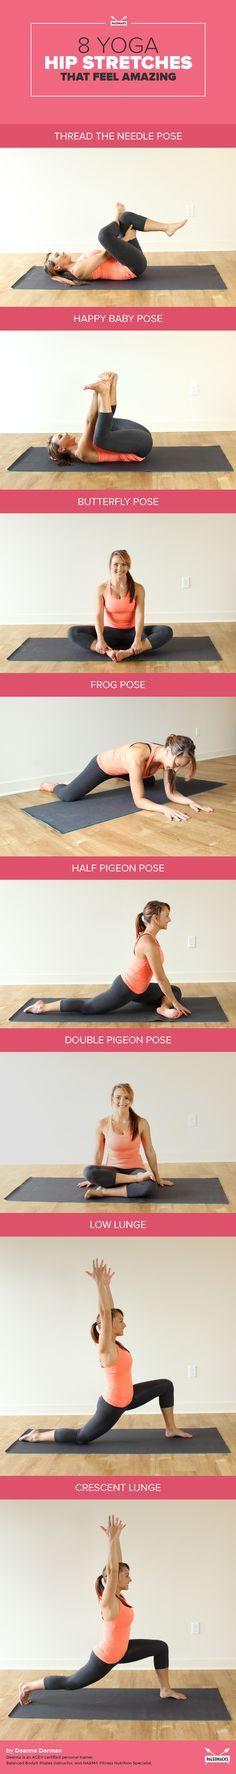 8 Yoga Hip Stretches That Feel Amazing